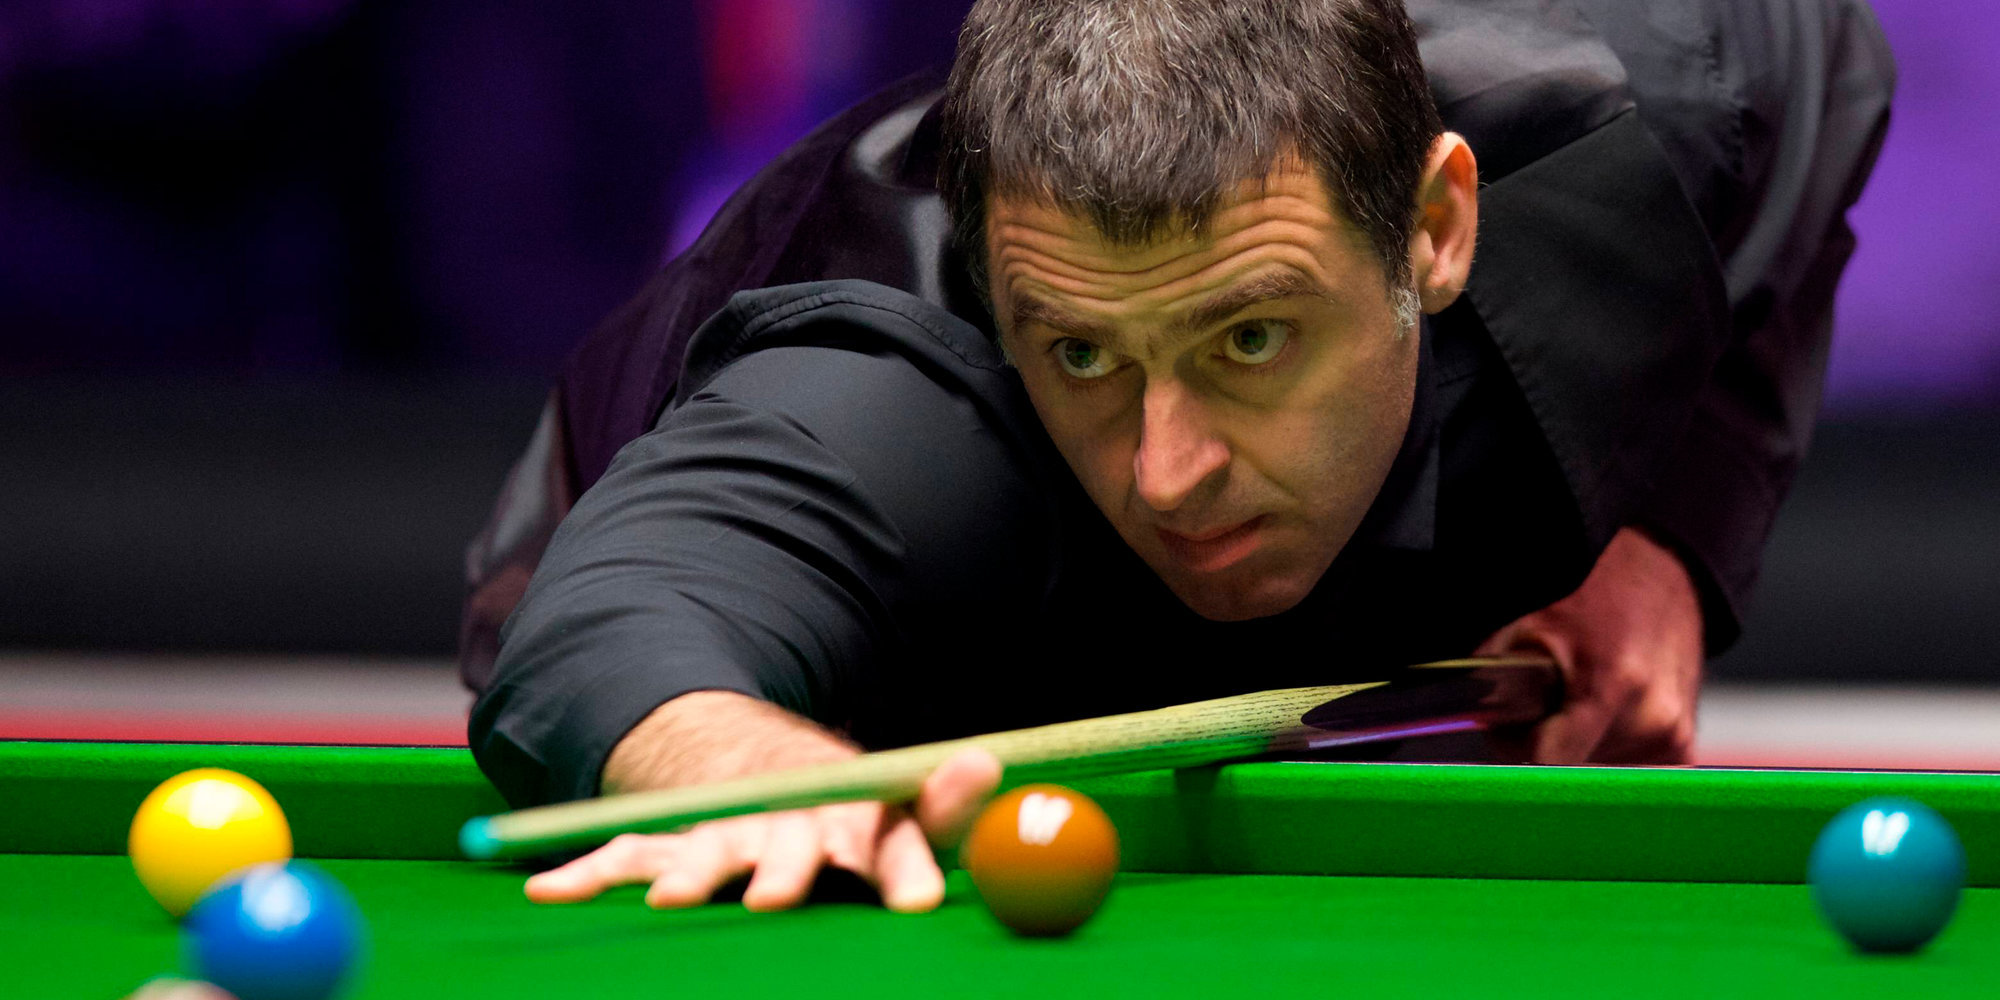 Scottish Open: в финал вышли О'Салливан и Селби